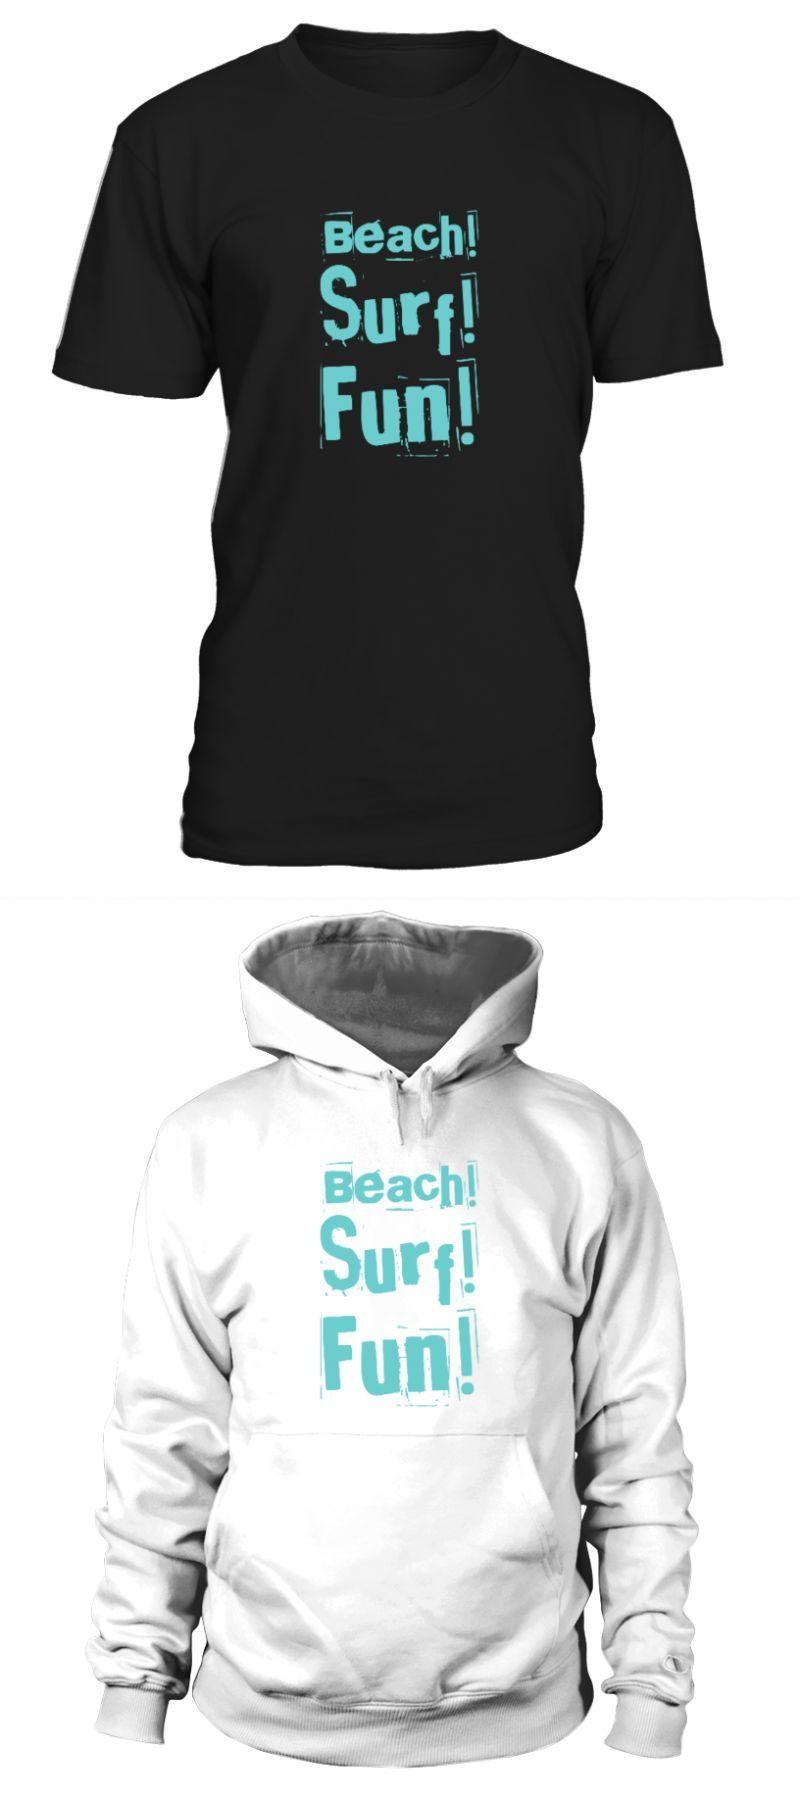 Volleyball T Shirt Model Beach Surf Fun Limited Edition Volleyball Camp T Shirt Volleyball Tshirts Volleyball Camp Surfing